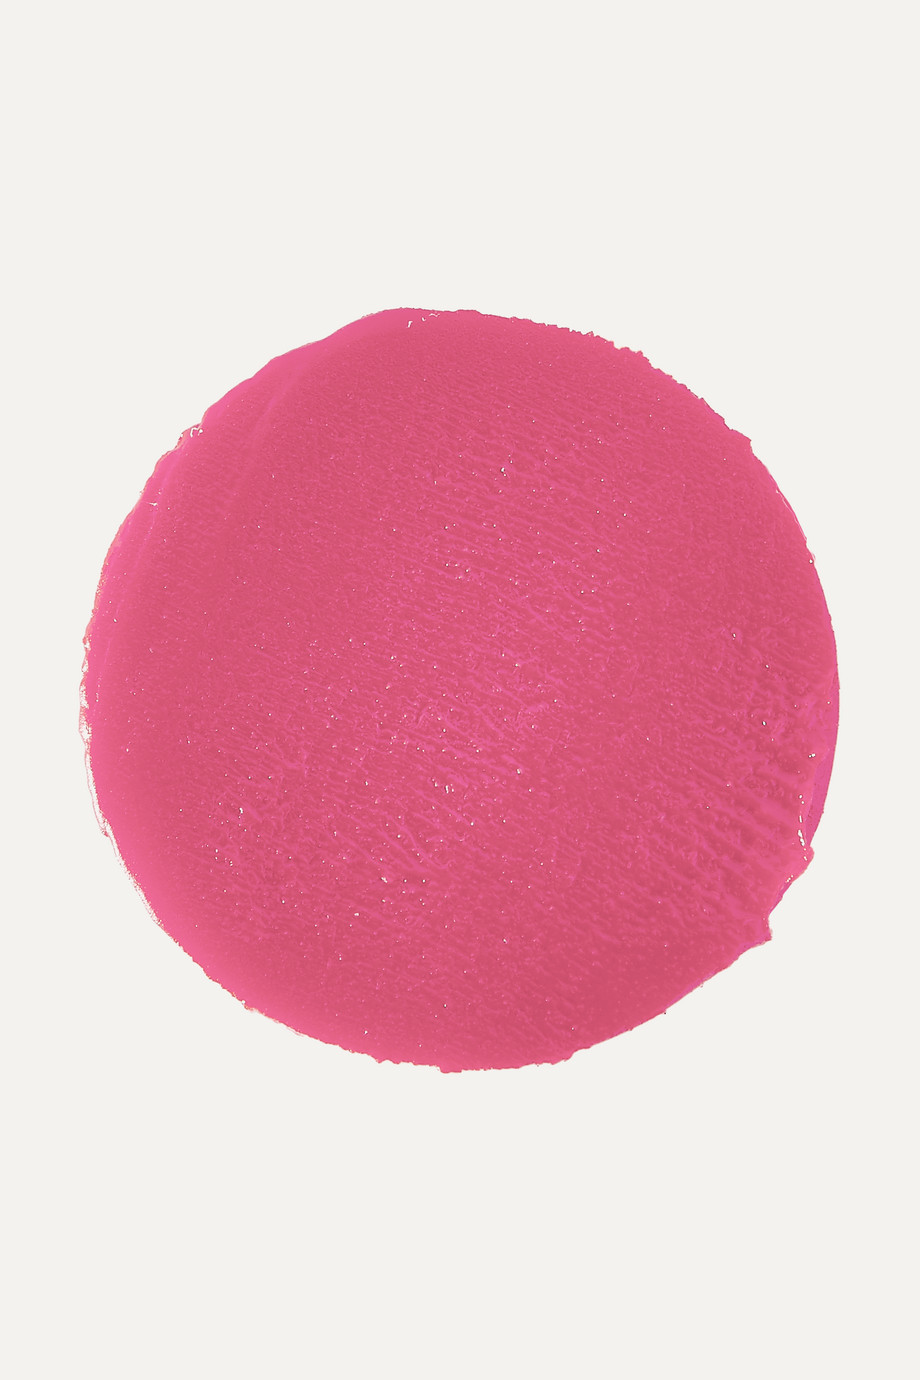 Christian Louboutin Beauty Rouge à lèvres Silky Satin, Bikini